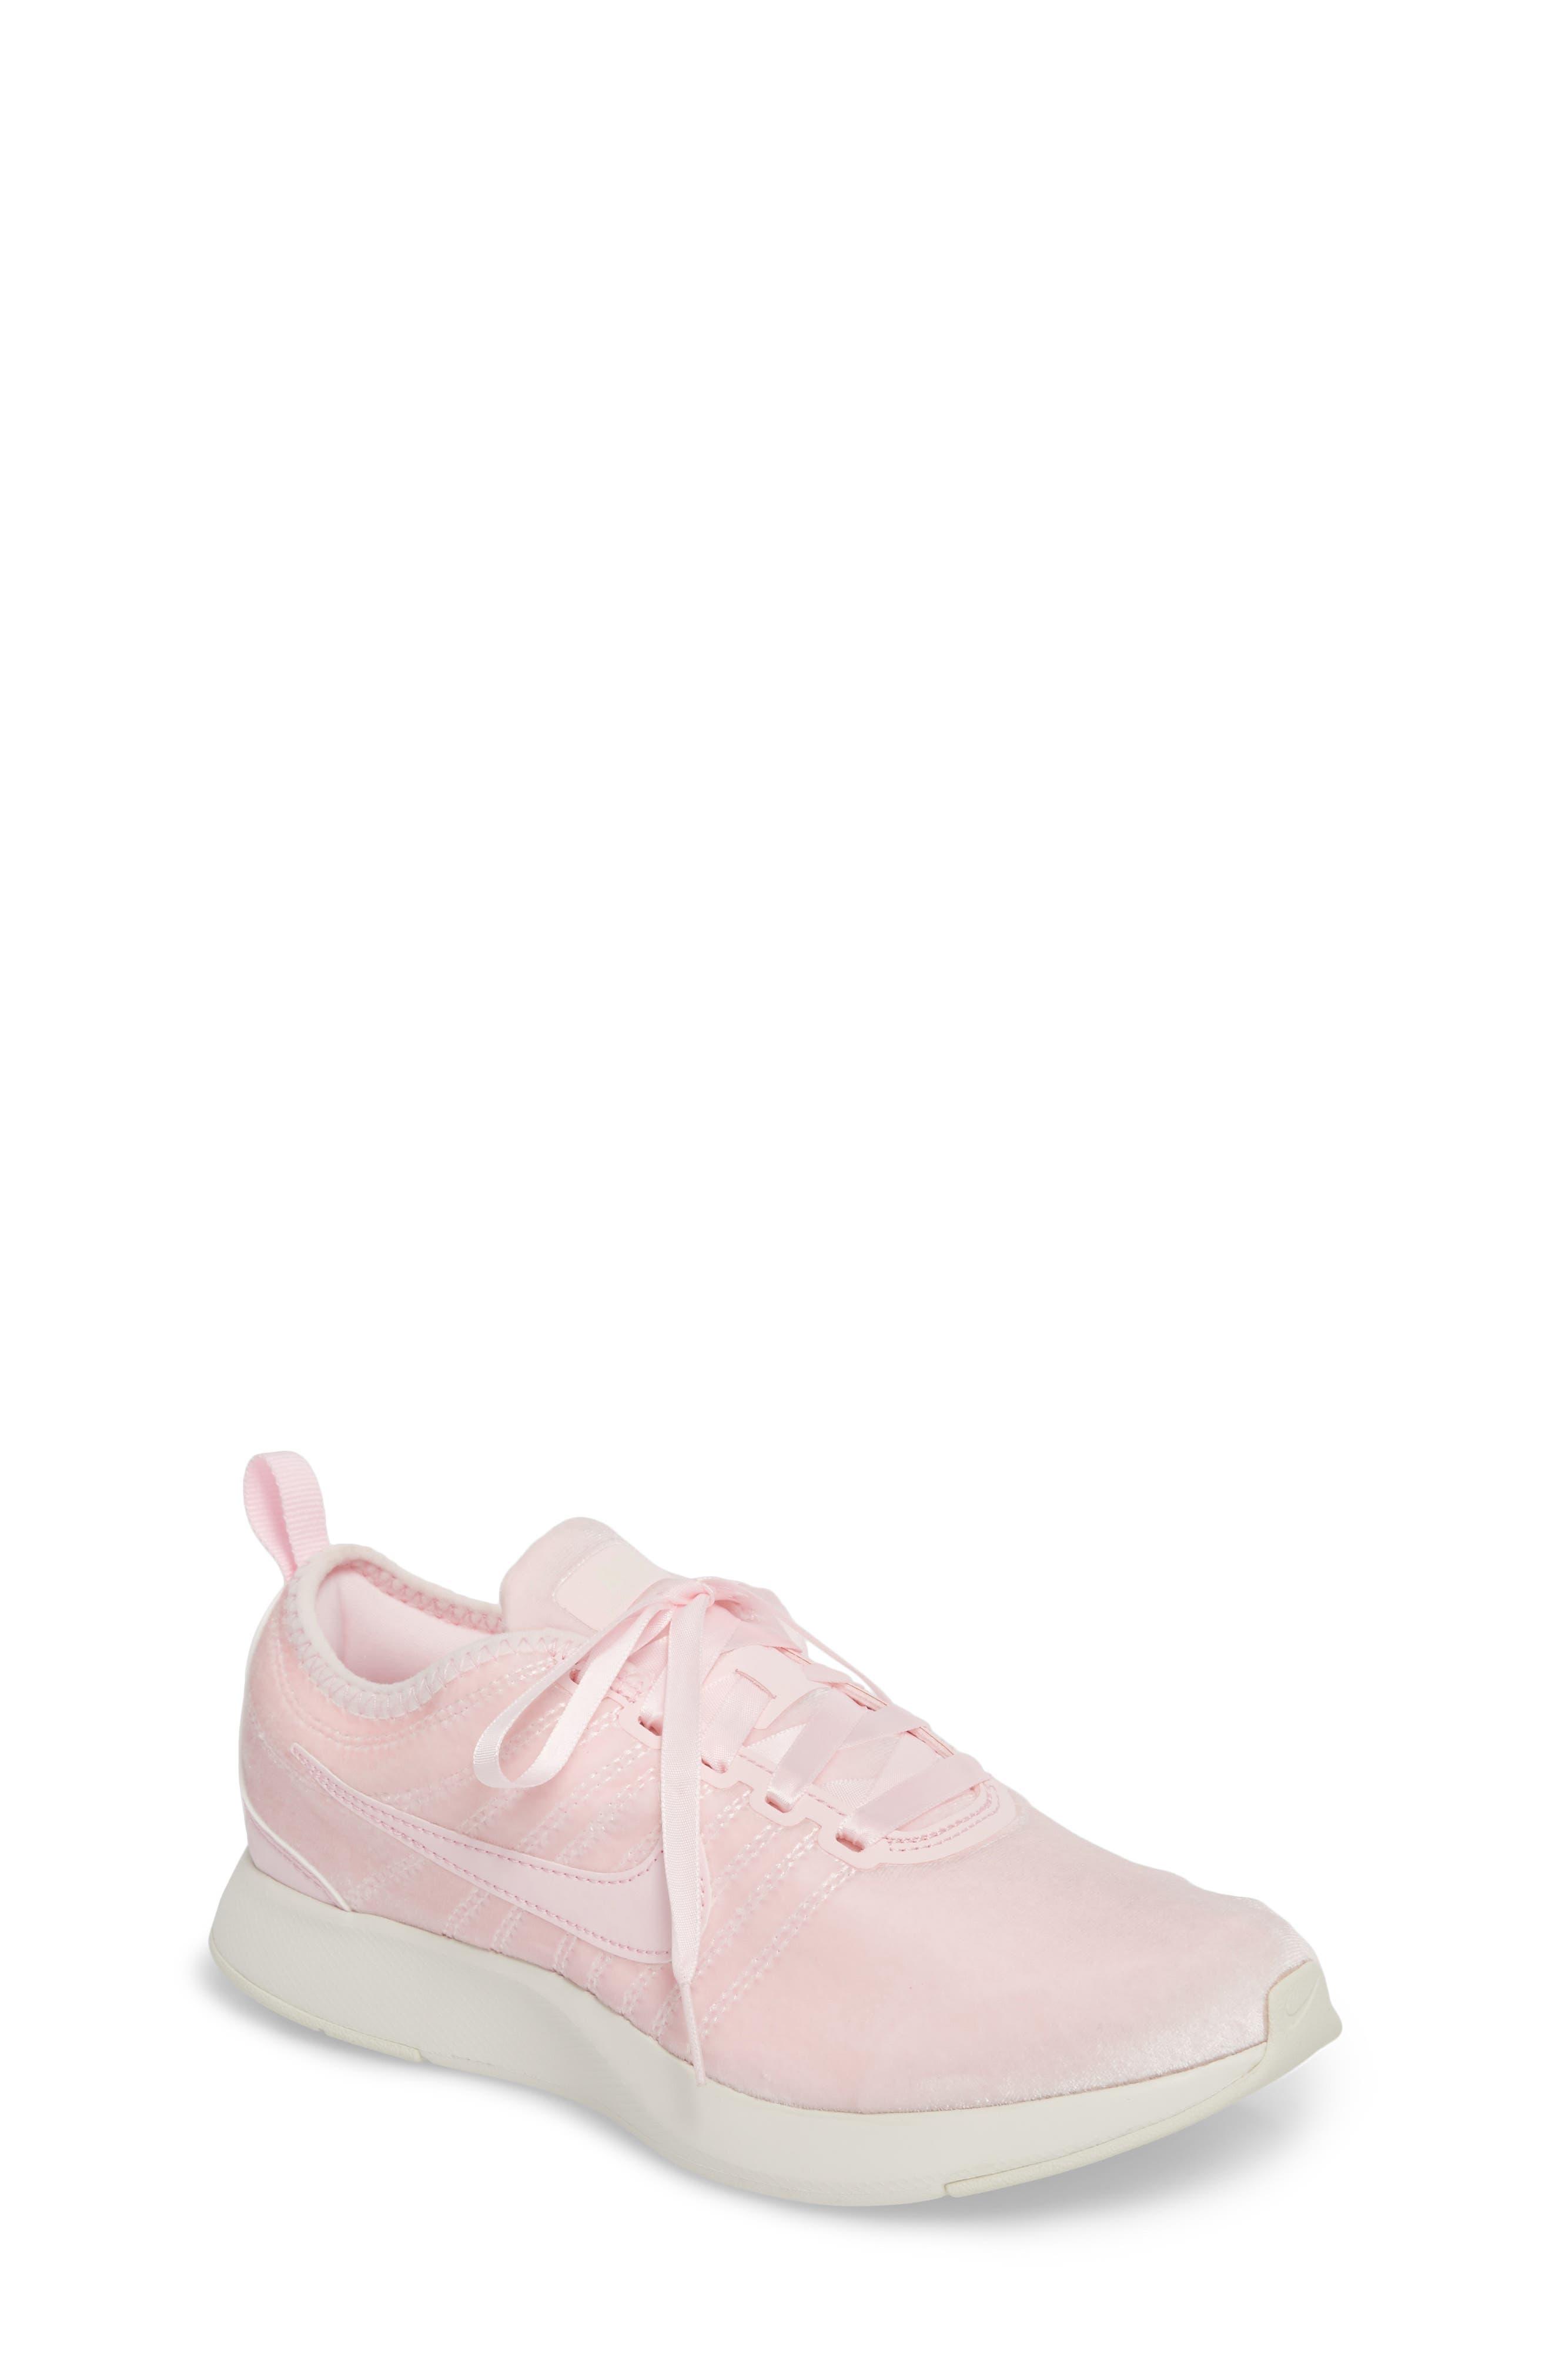 Dualtone Racer SE Sneaker,                             Main thumbnail 1, color,                             Arctic Pink/ Arctic Pink/ Sail